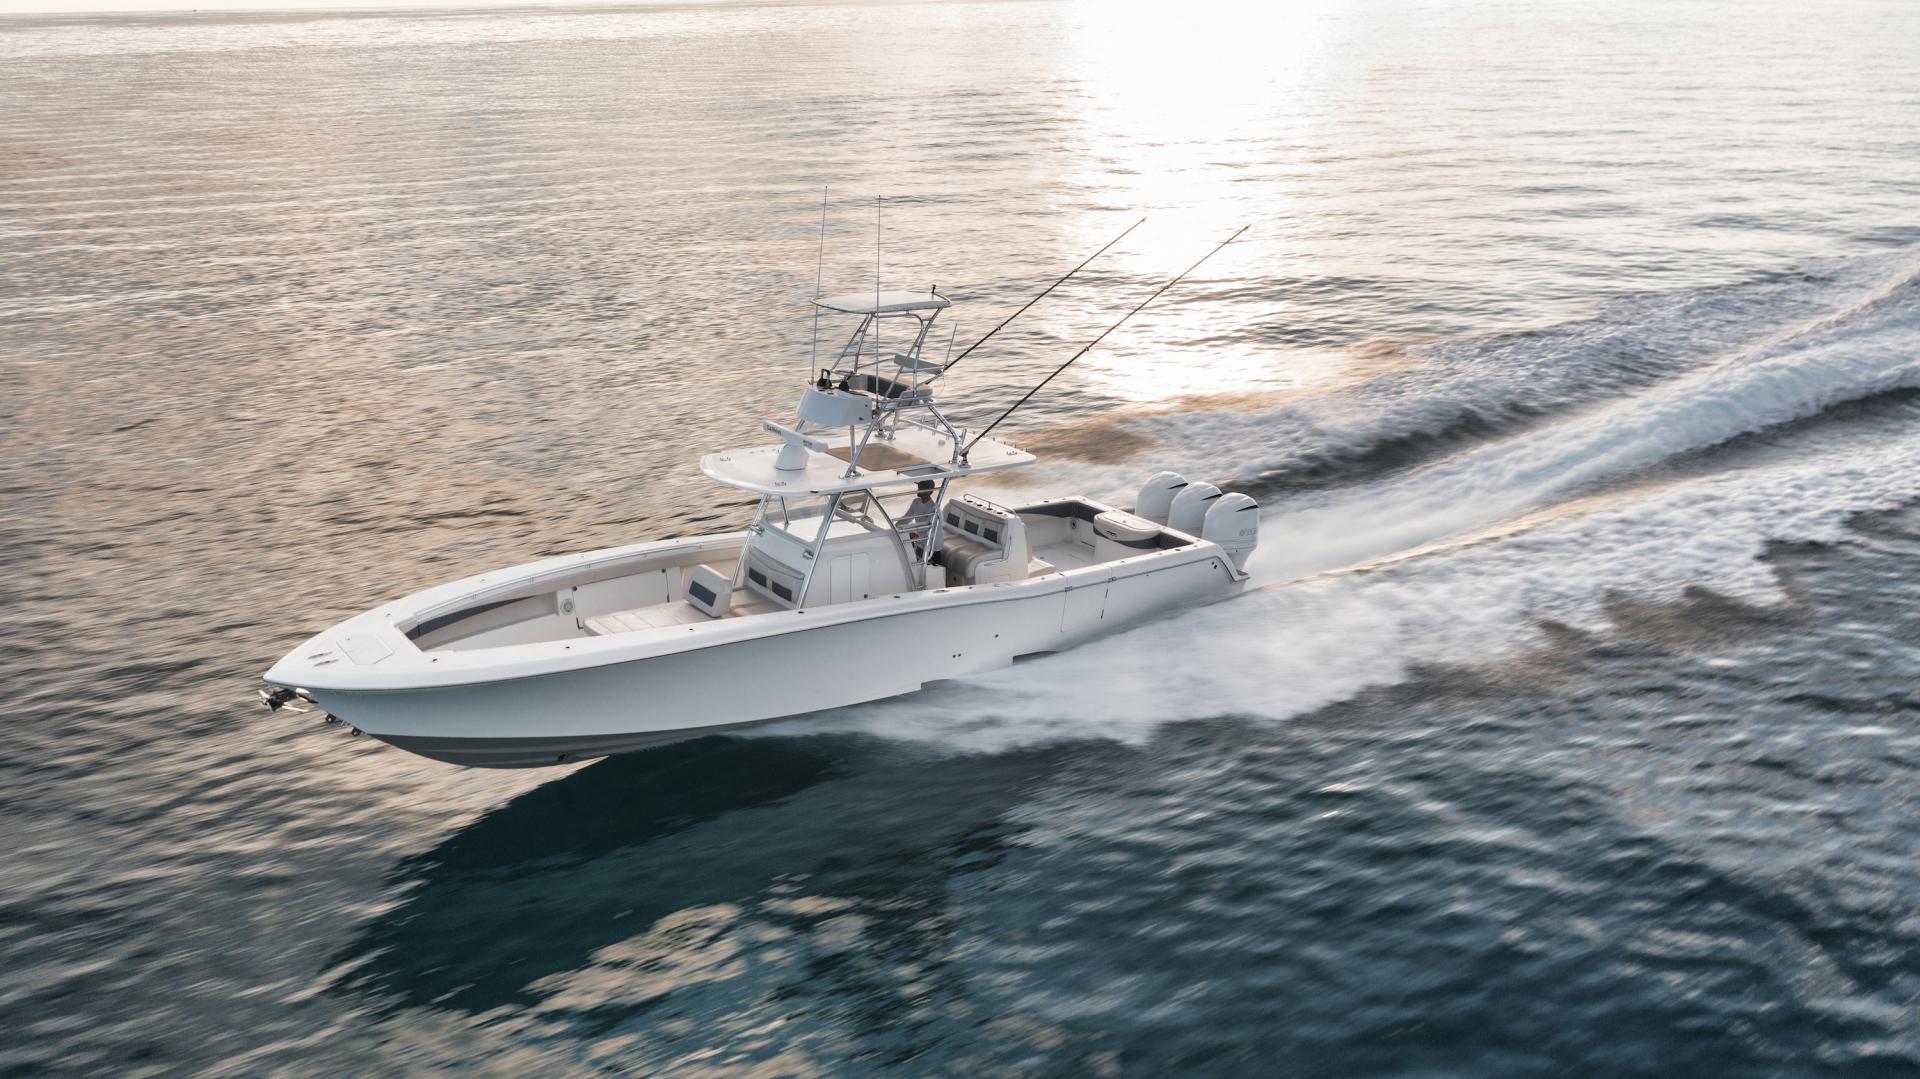 Invincible-Open Fisherman 2017-42 Invincible Jupiter-Florida-United States-1604178   Thumbnail